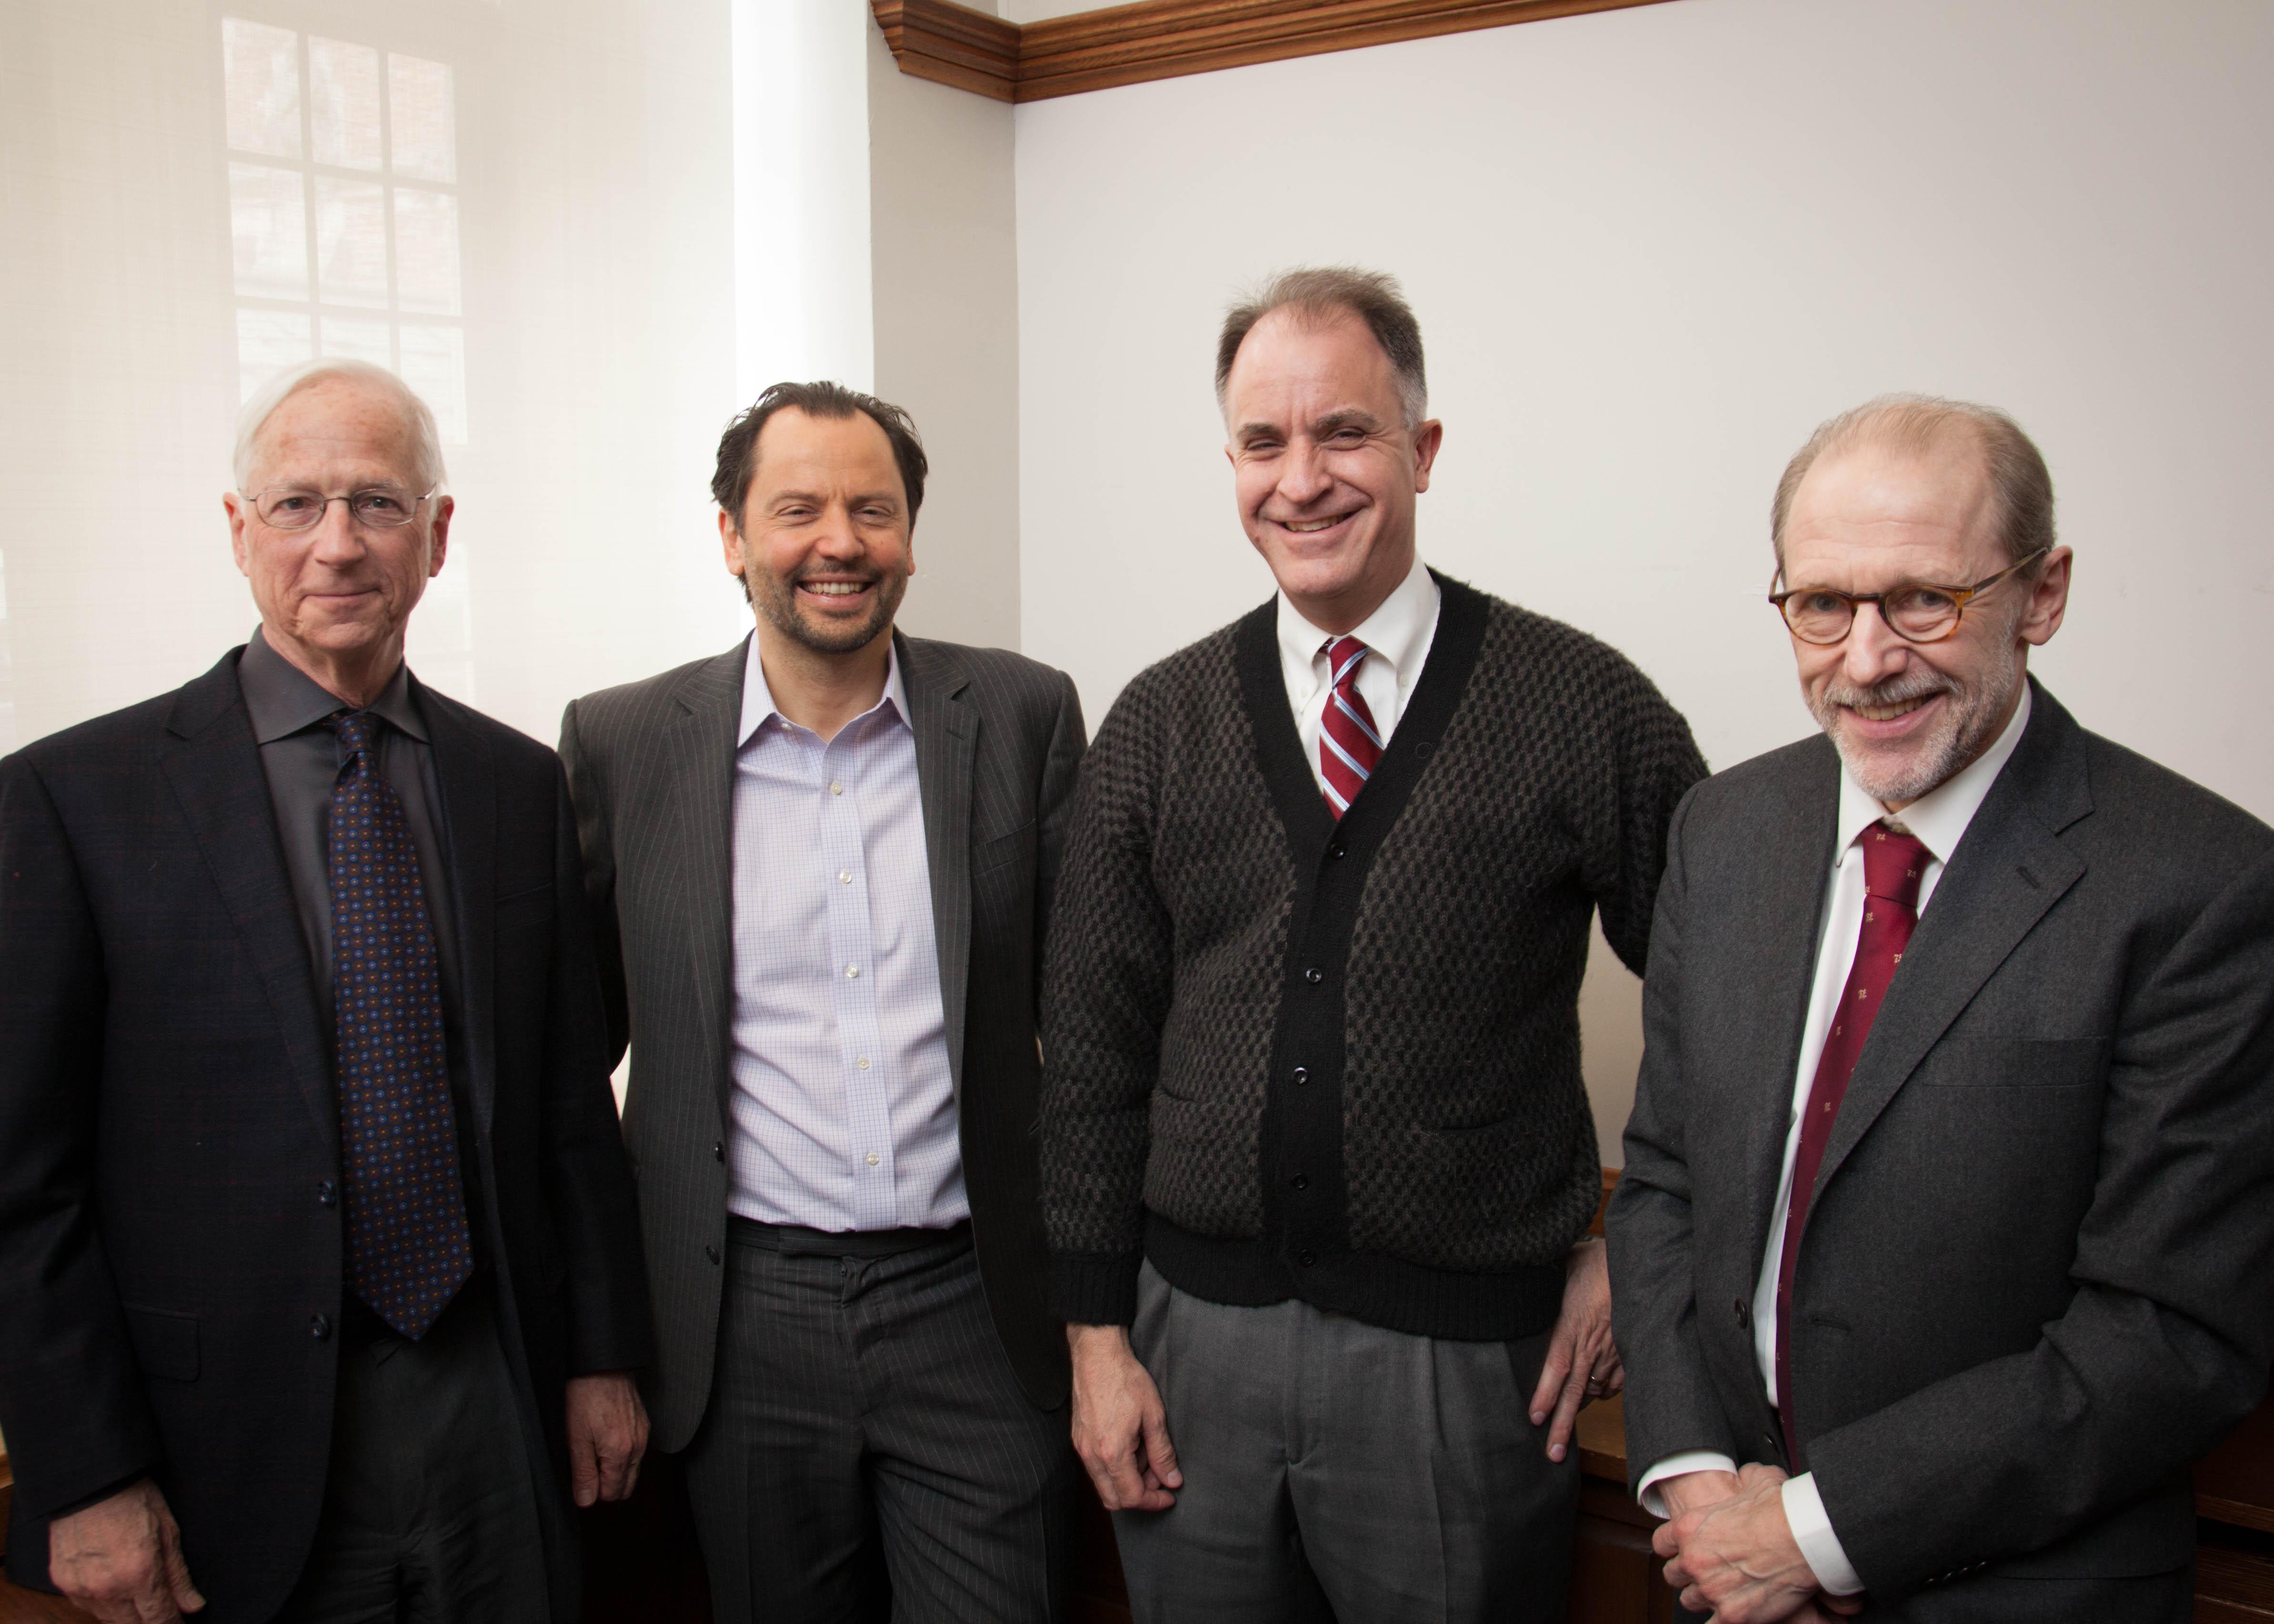 YLS Prof. Alan Schwartz '64, Chicago Booth Prof. Luigi Zingales, NYU Stern Prof. David Yermack, and YLS Prof. Henry Hansmann '74